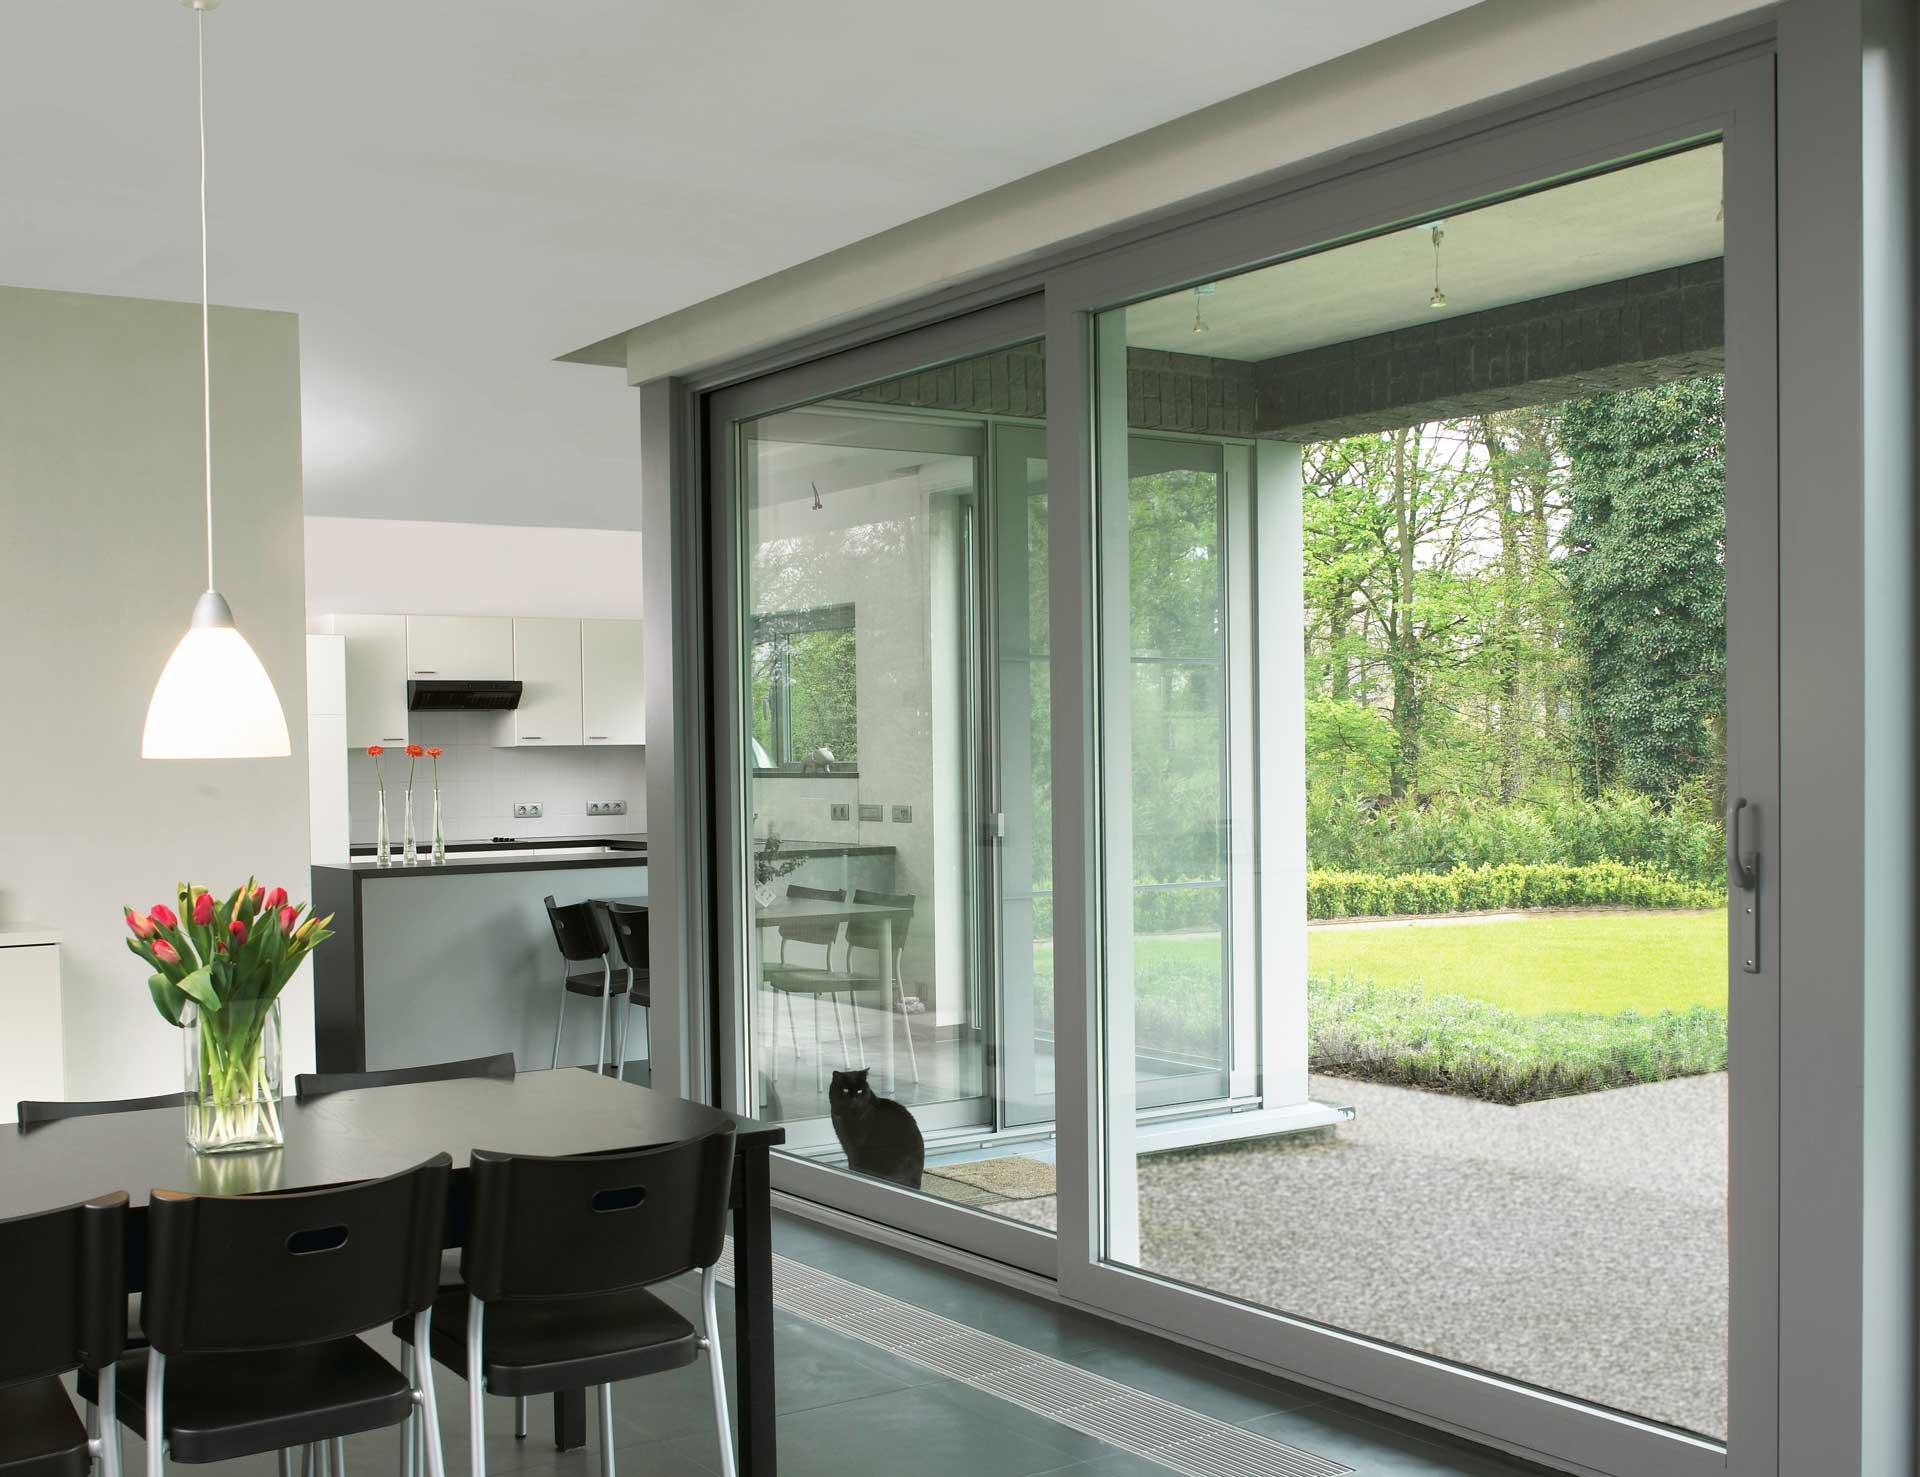 Kingfisher Windows Add A New Aluminium Lift Amp Slide To Its